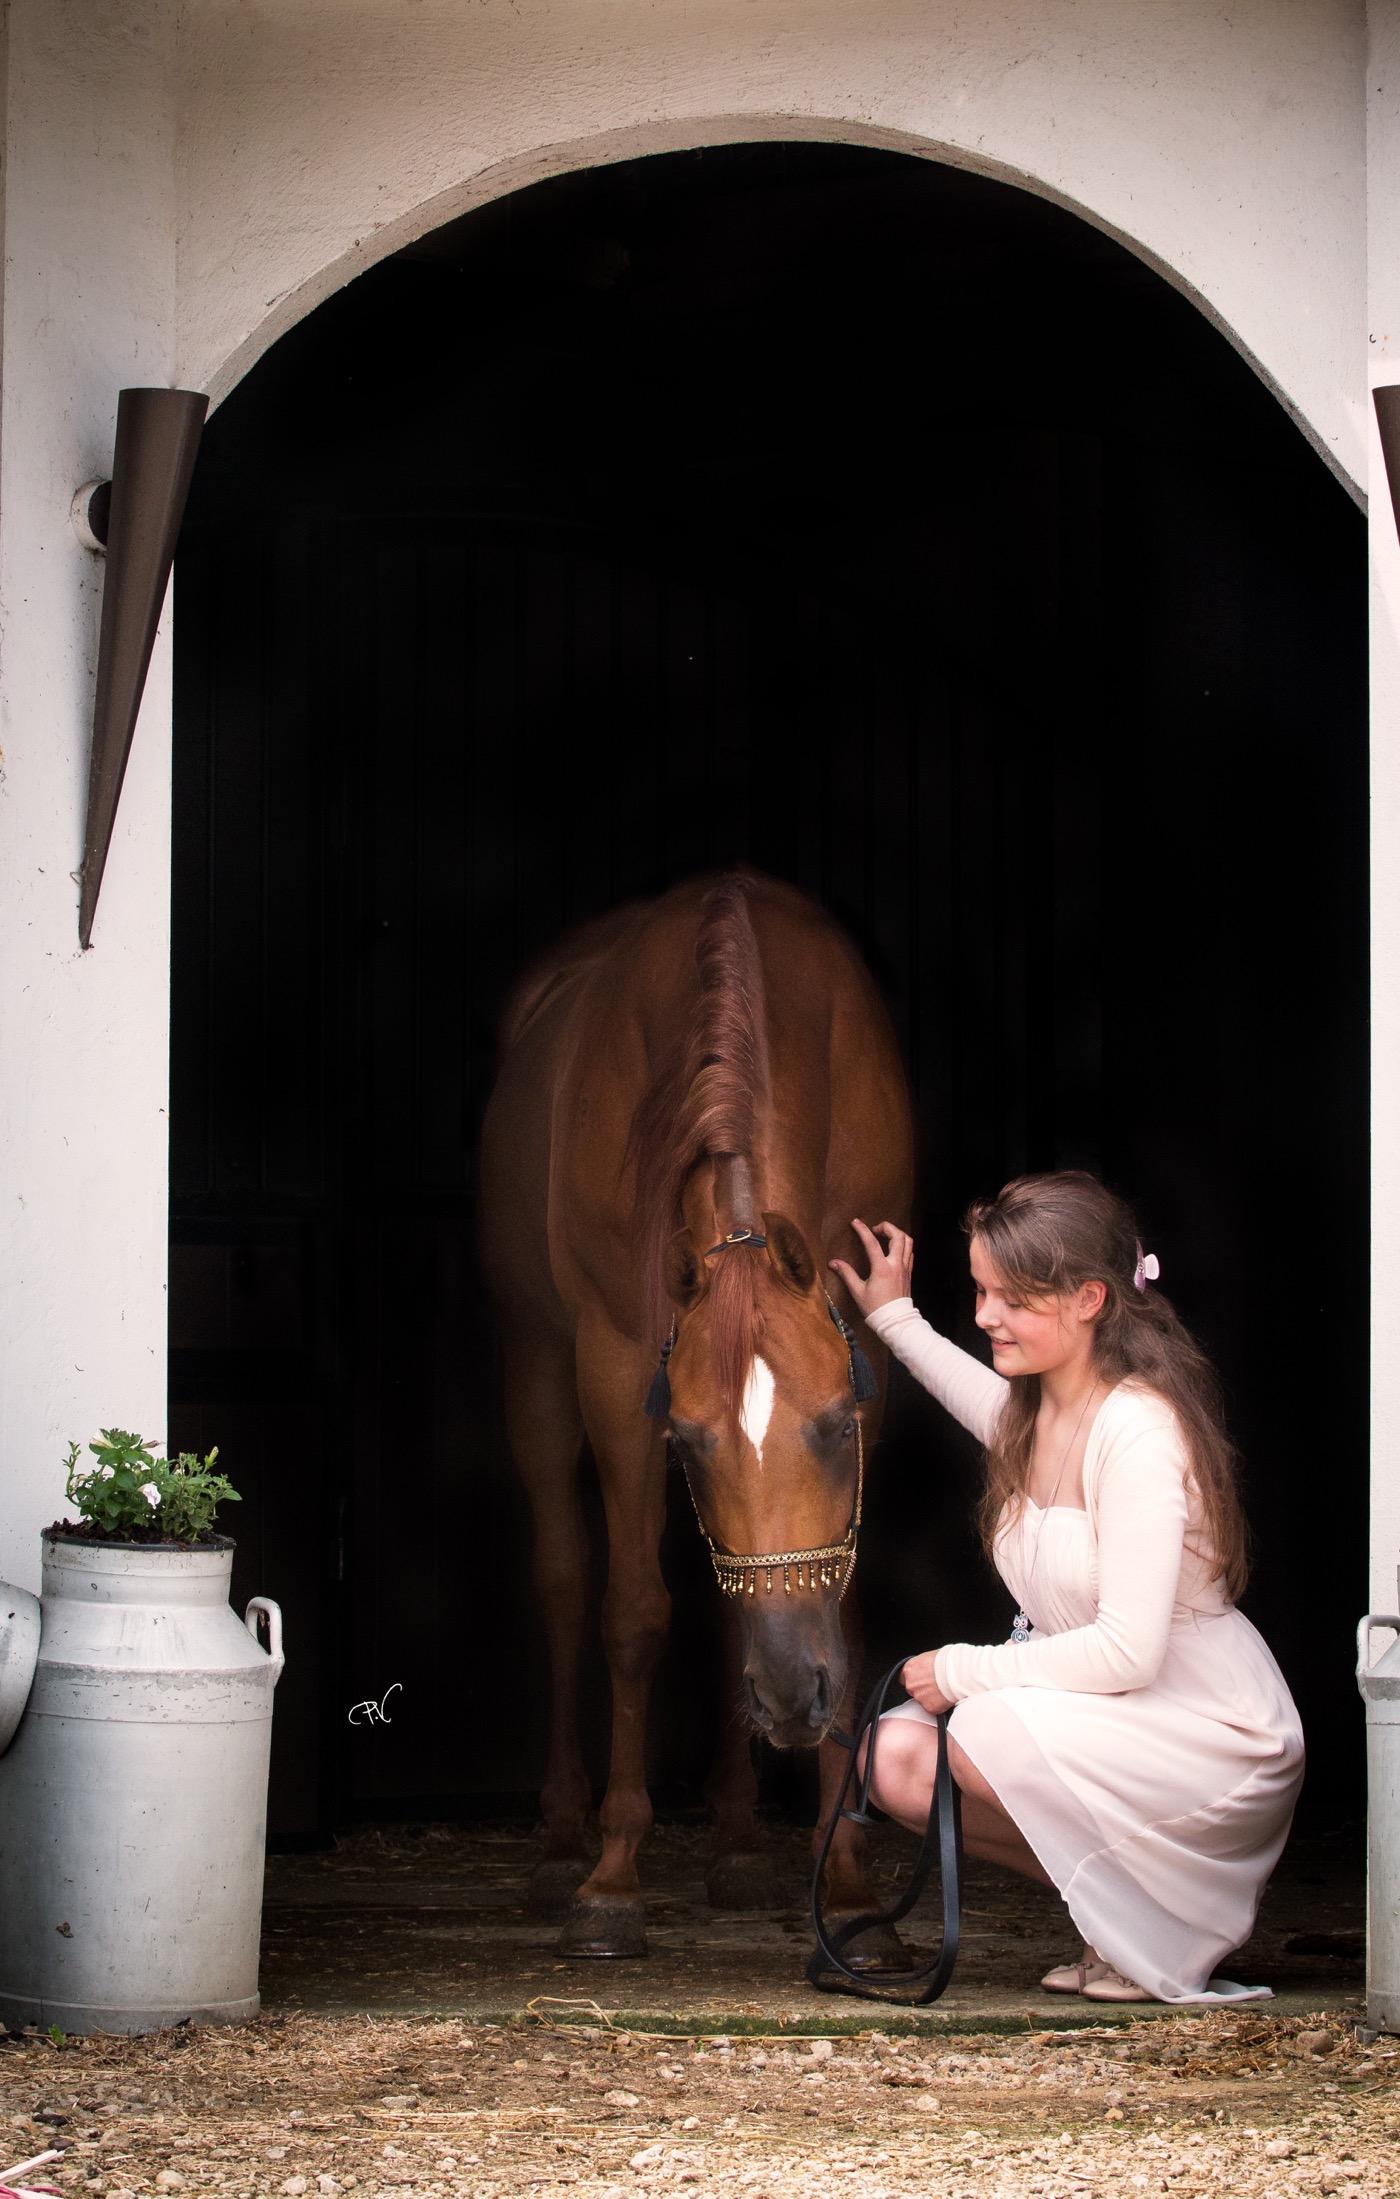 VDB_ARABIANS_HORSES06